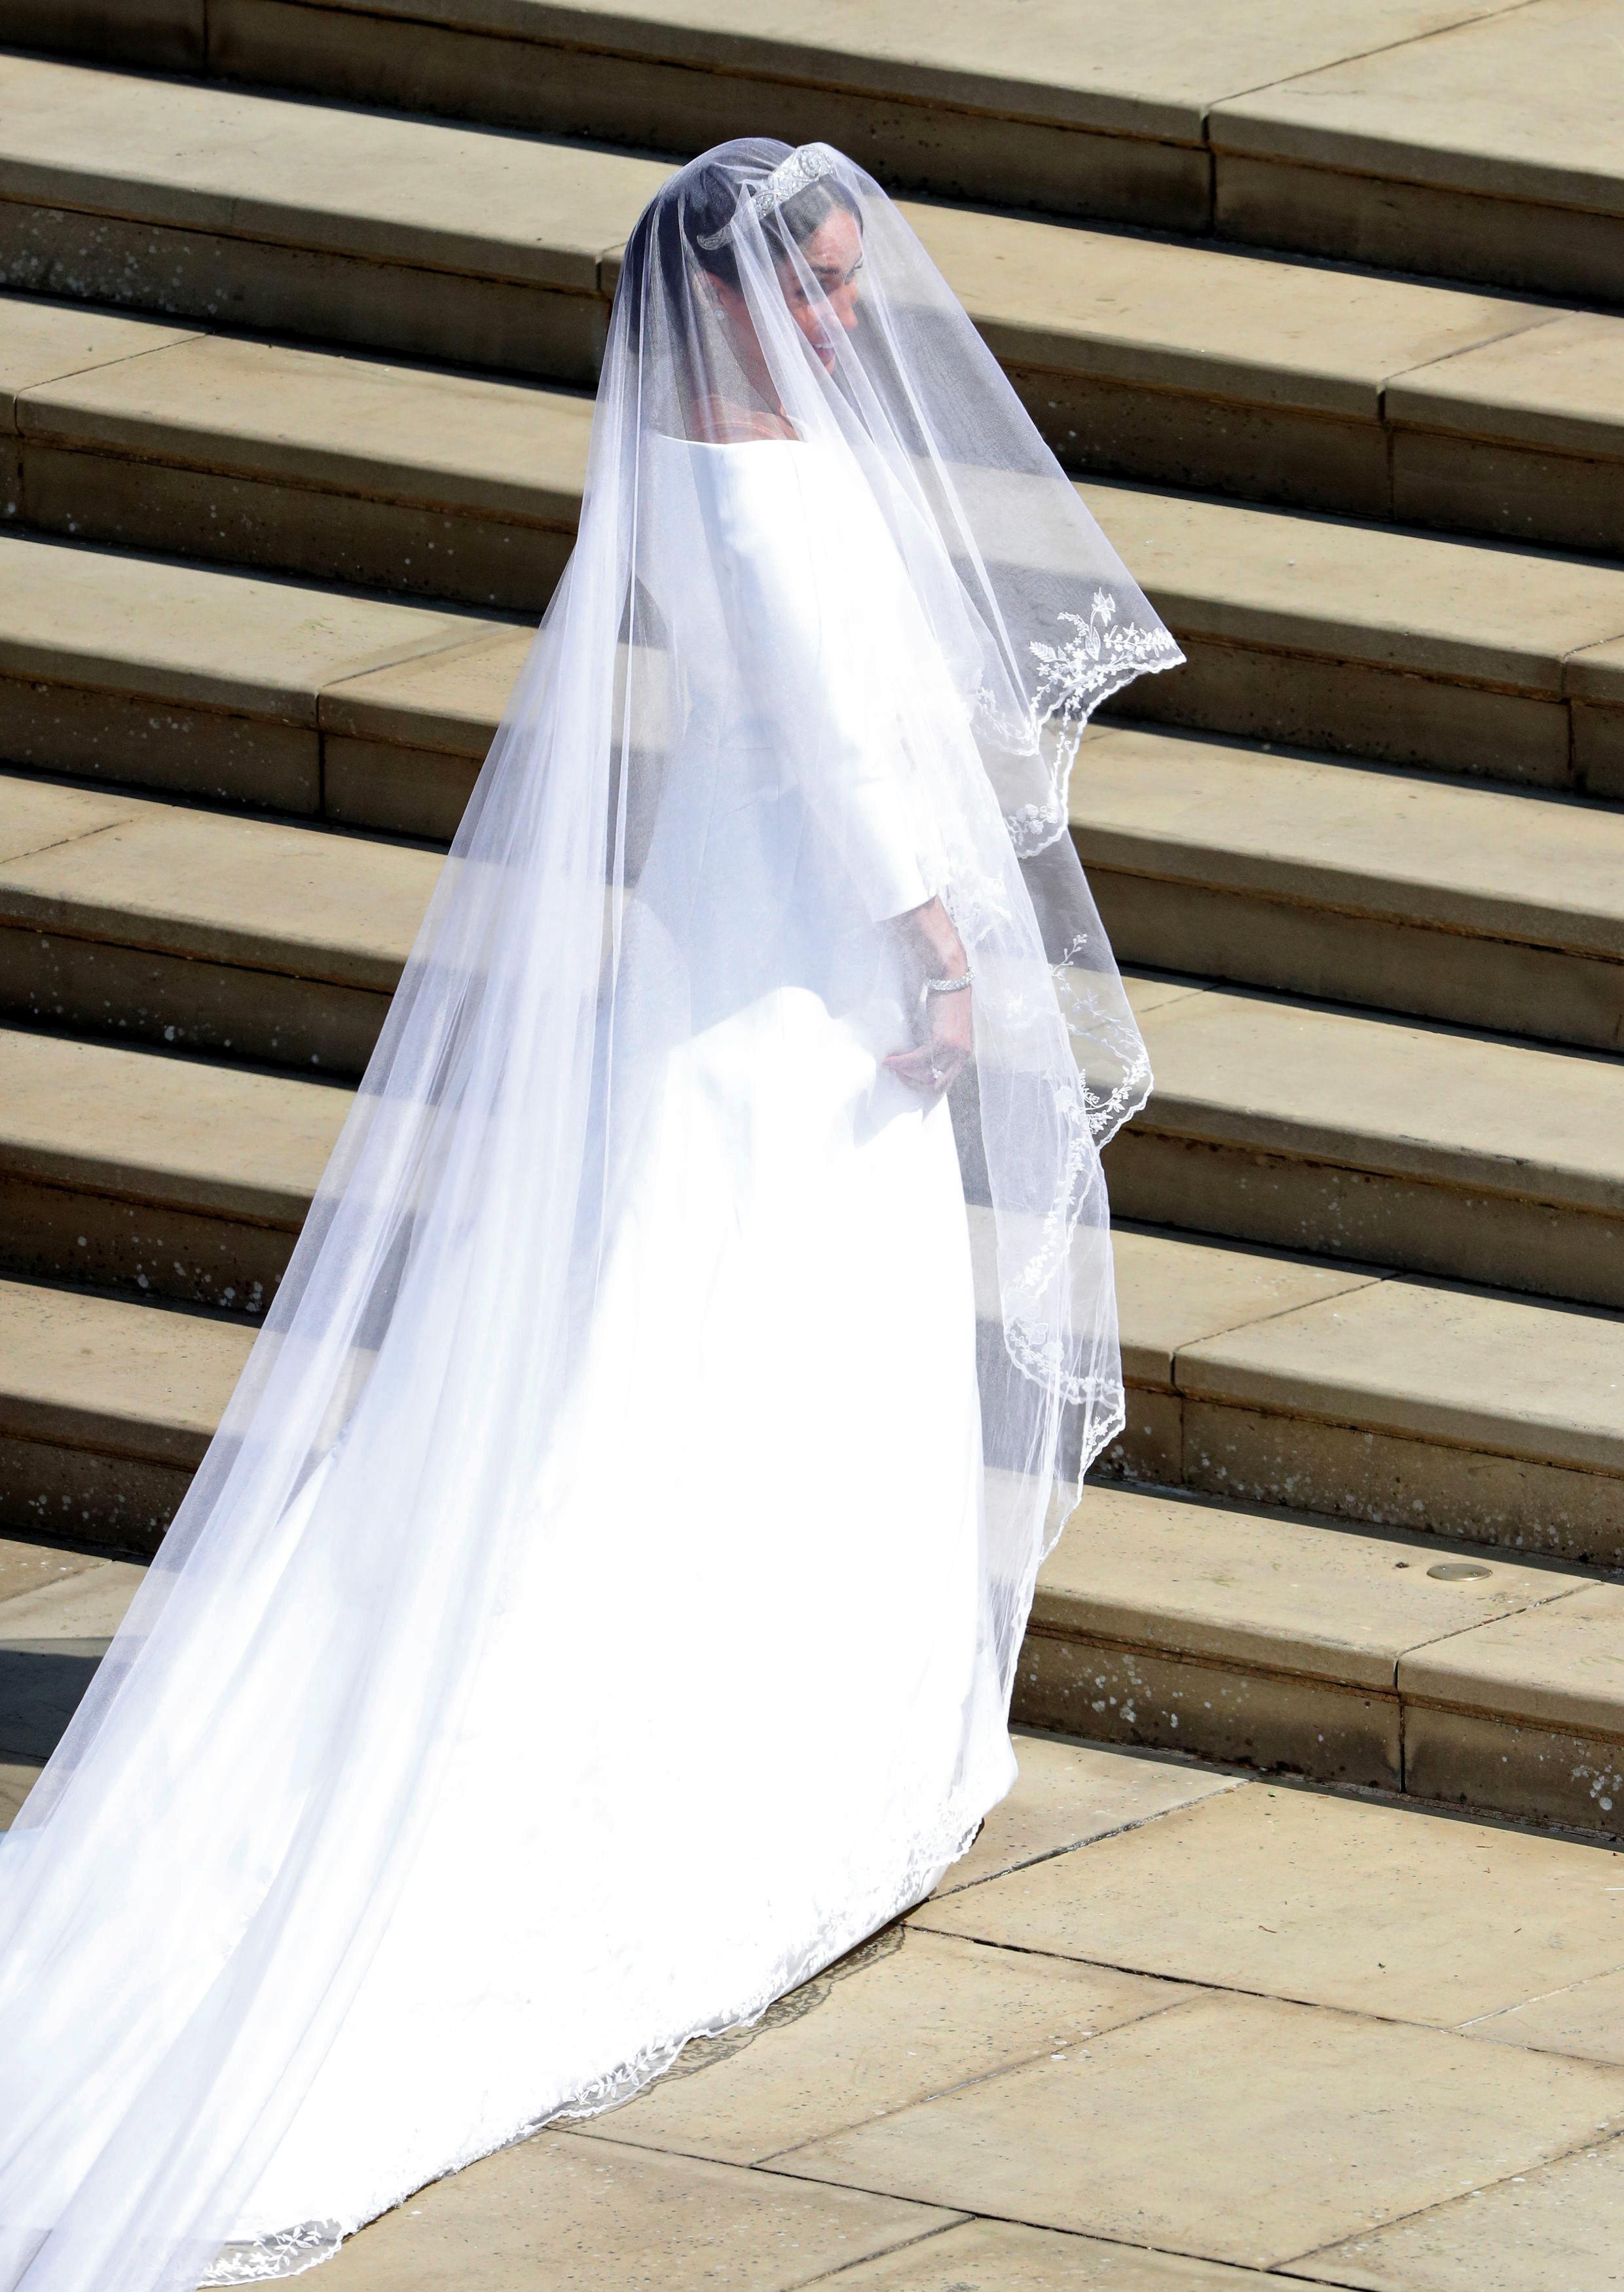 Meghan Markle's Givenchy wedding dress.